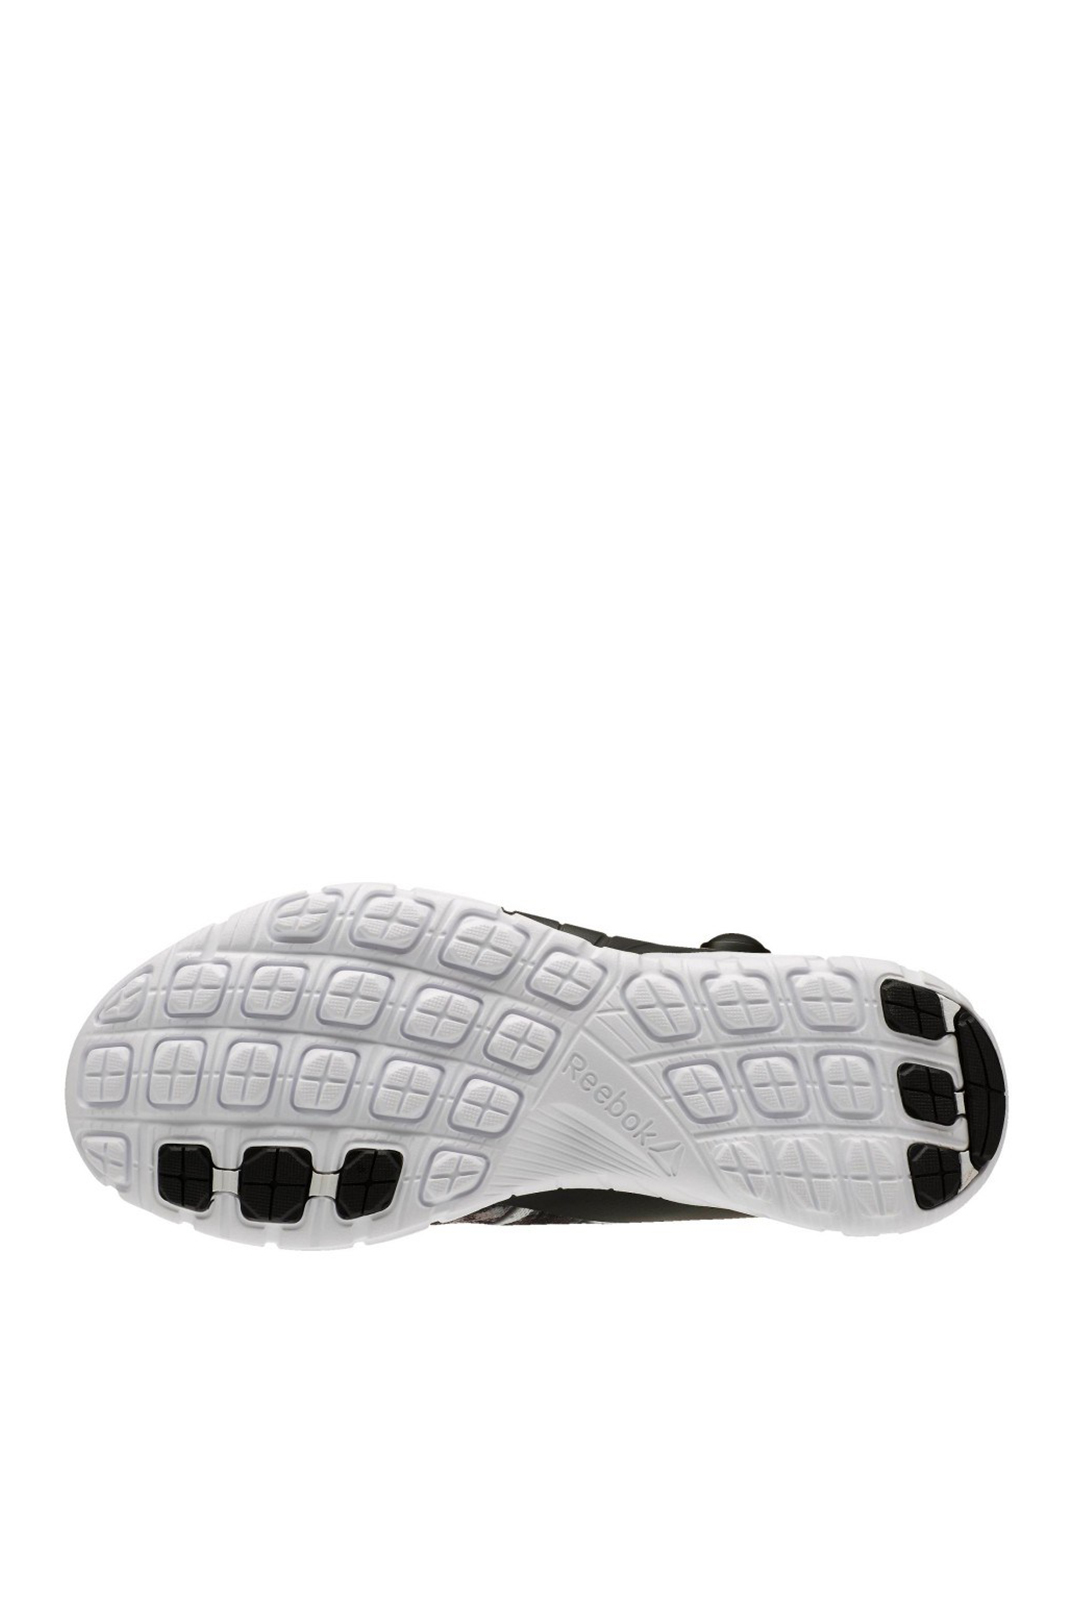 Baskets / Sneakers  Reebok V72624 ZPUMP FUSION 2.0 DU GREY